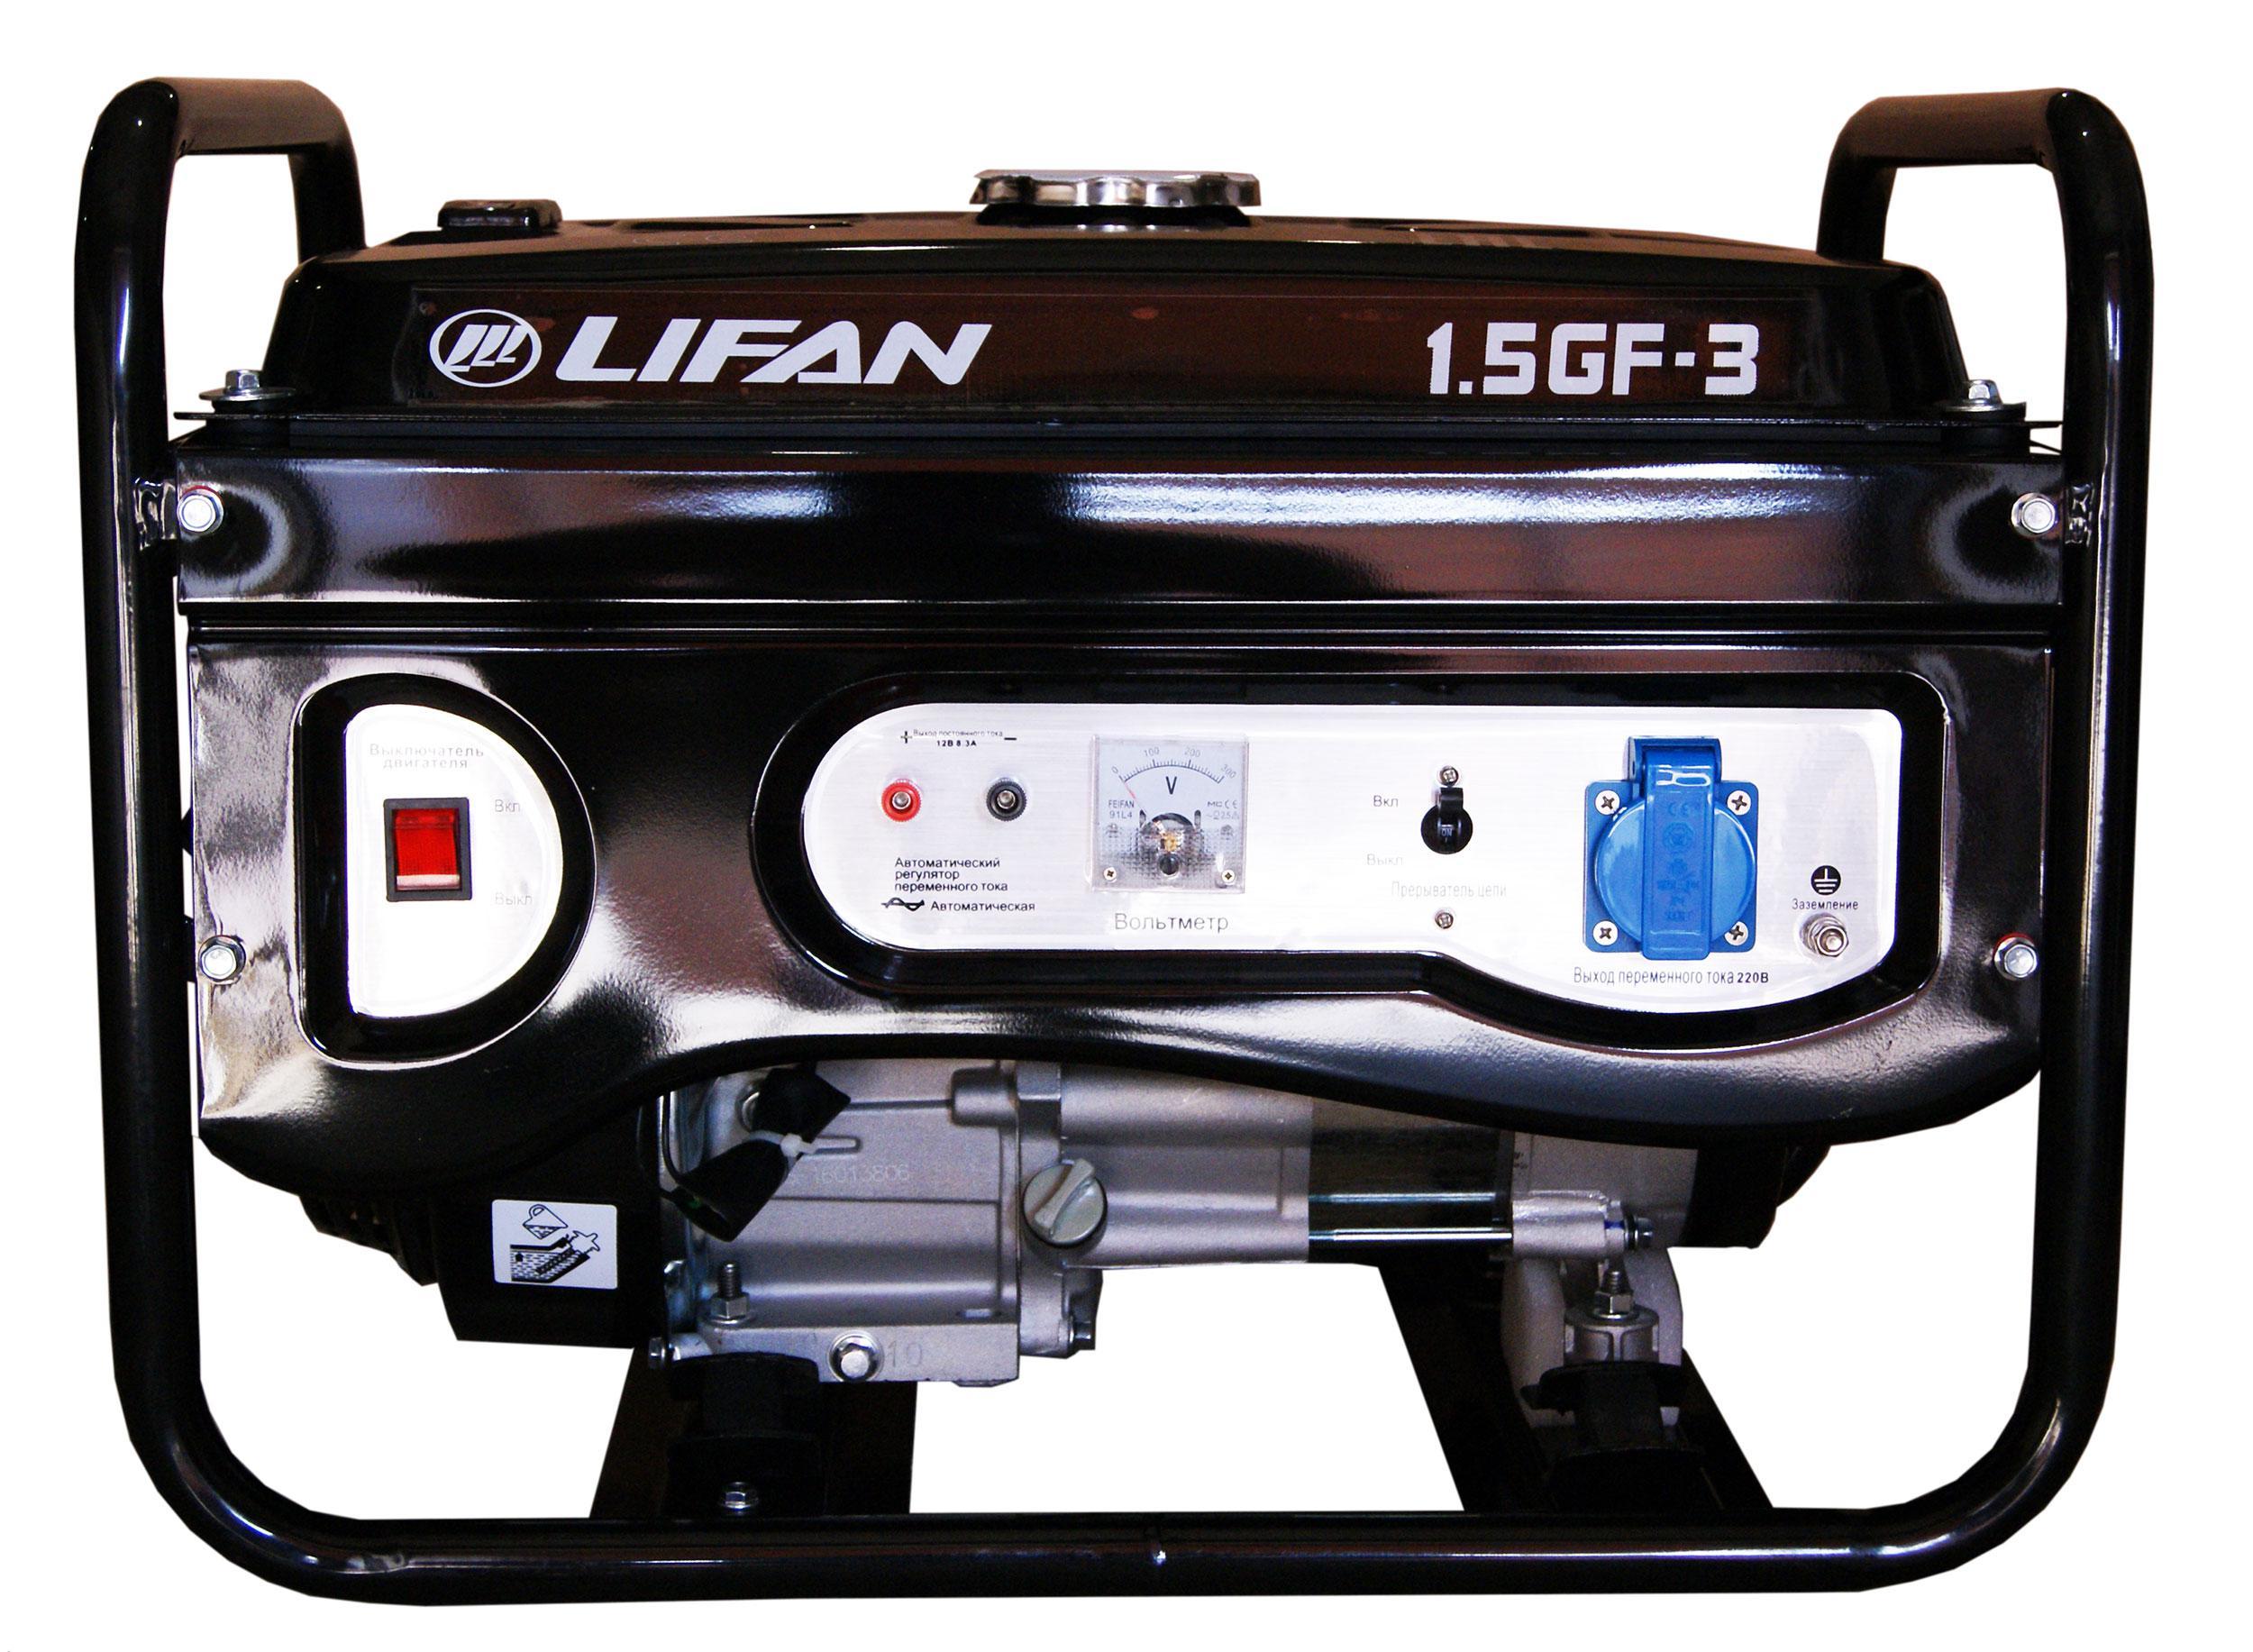 Генератор Lifan 1.5gf-3 бензиновый генератор автомат lifan 5gf 5a